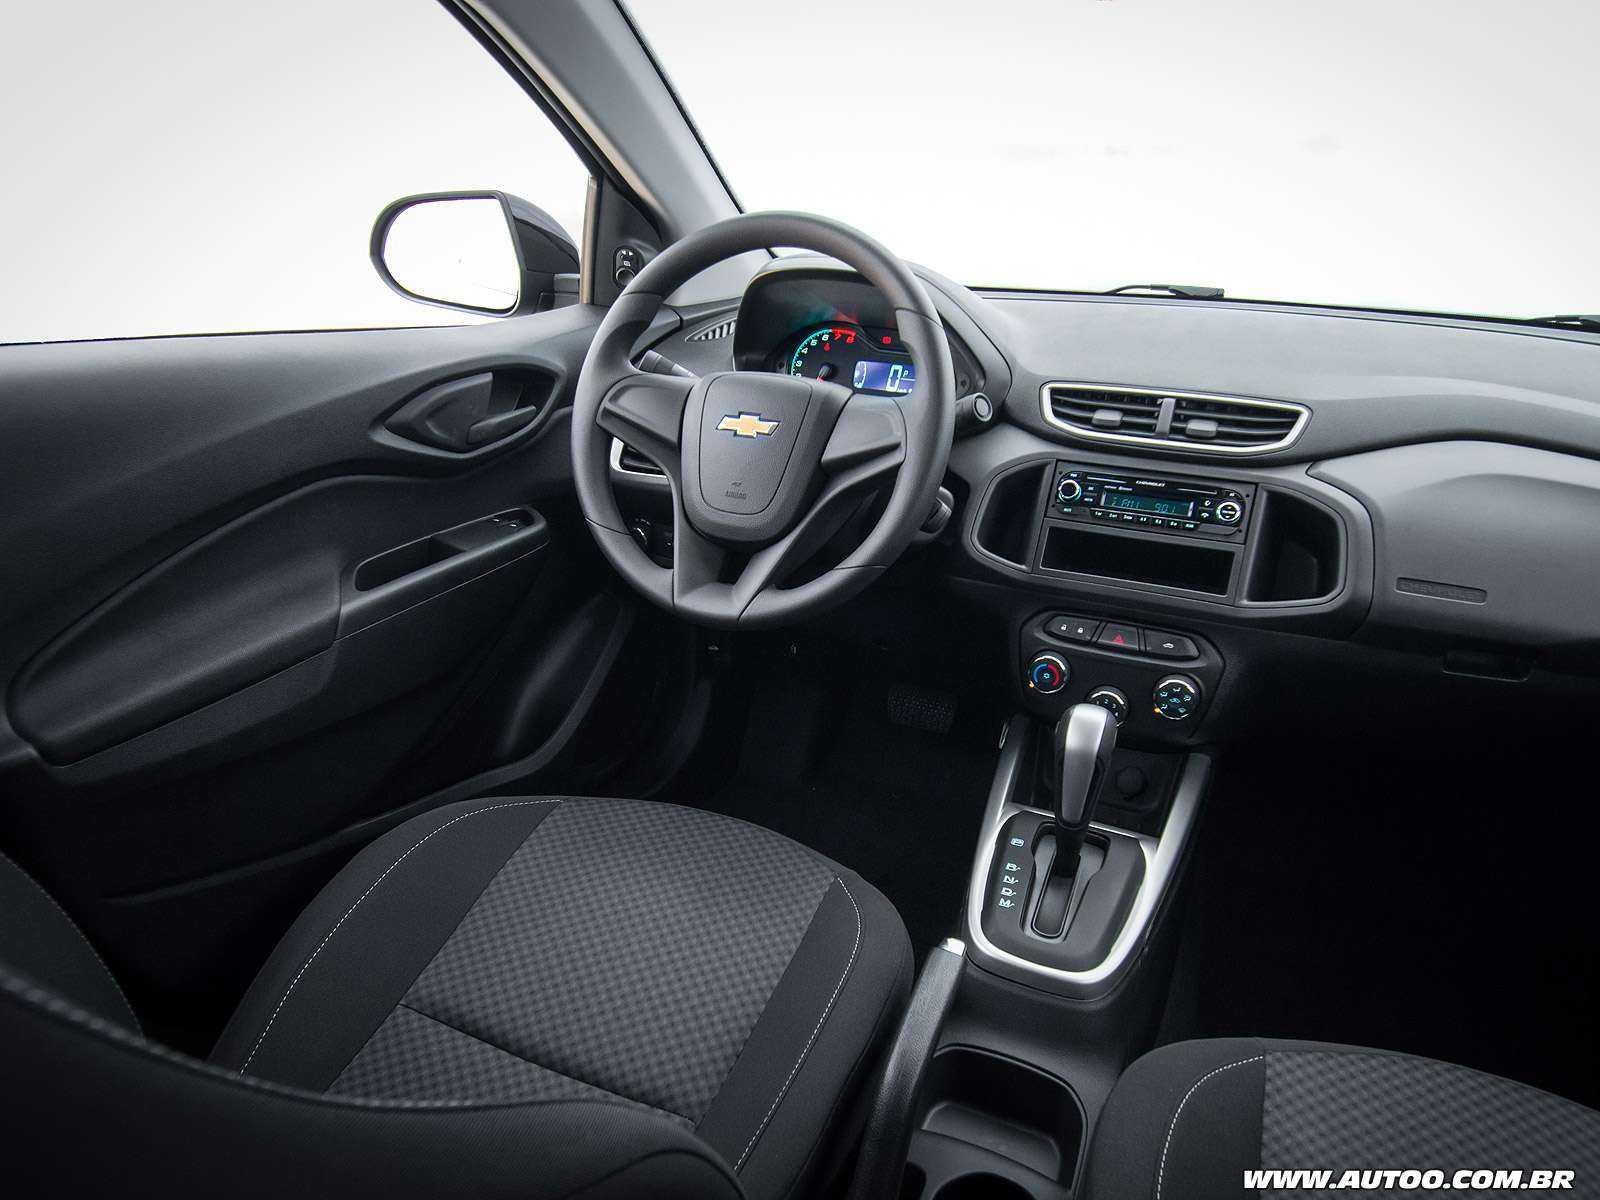 ChevroletPrisma 2018 - painel